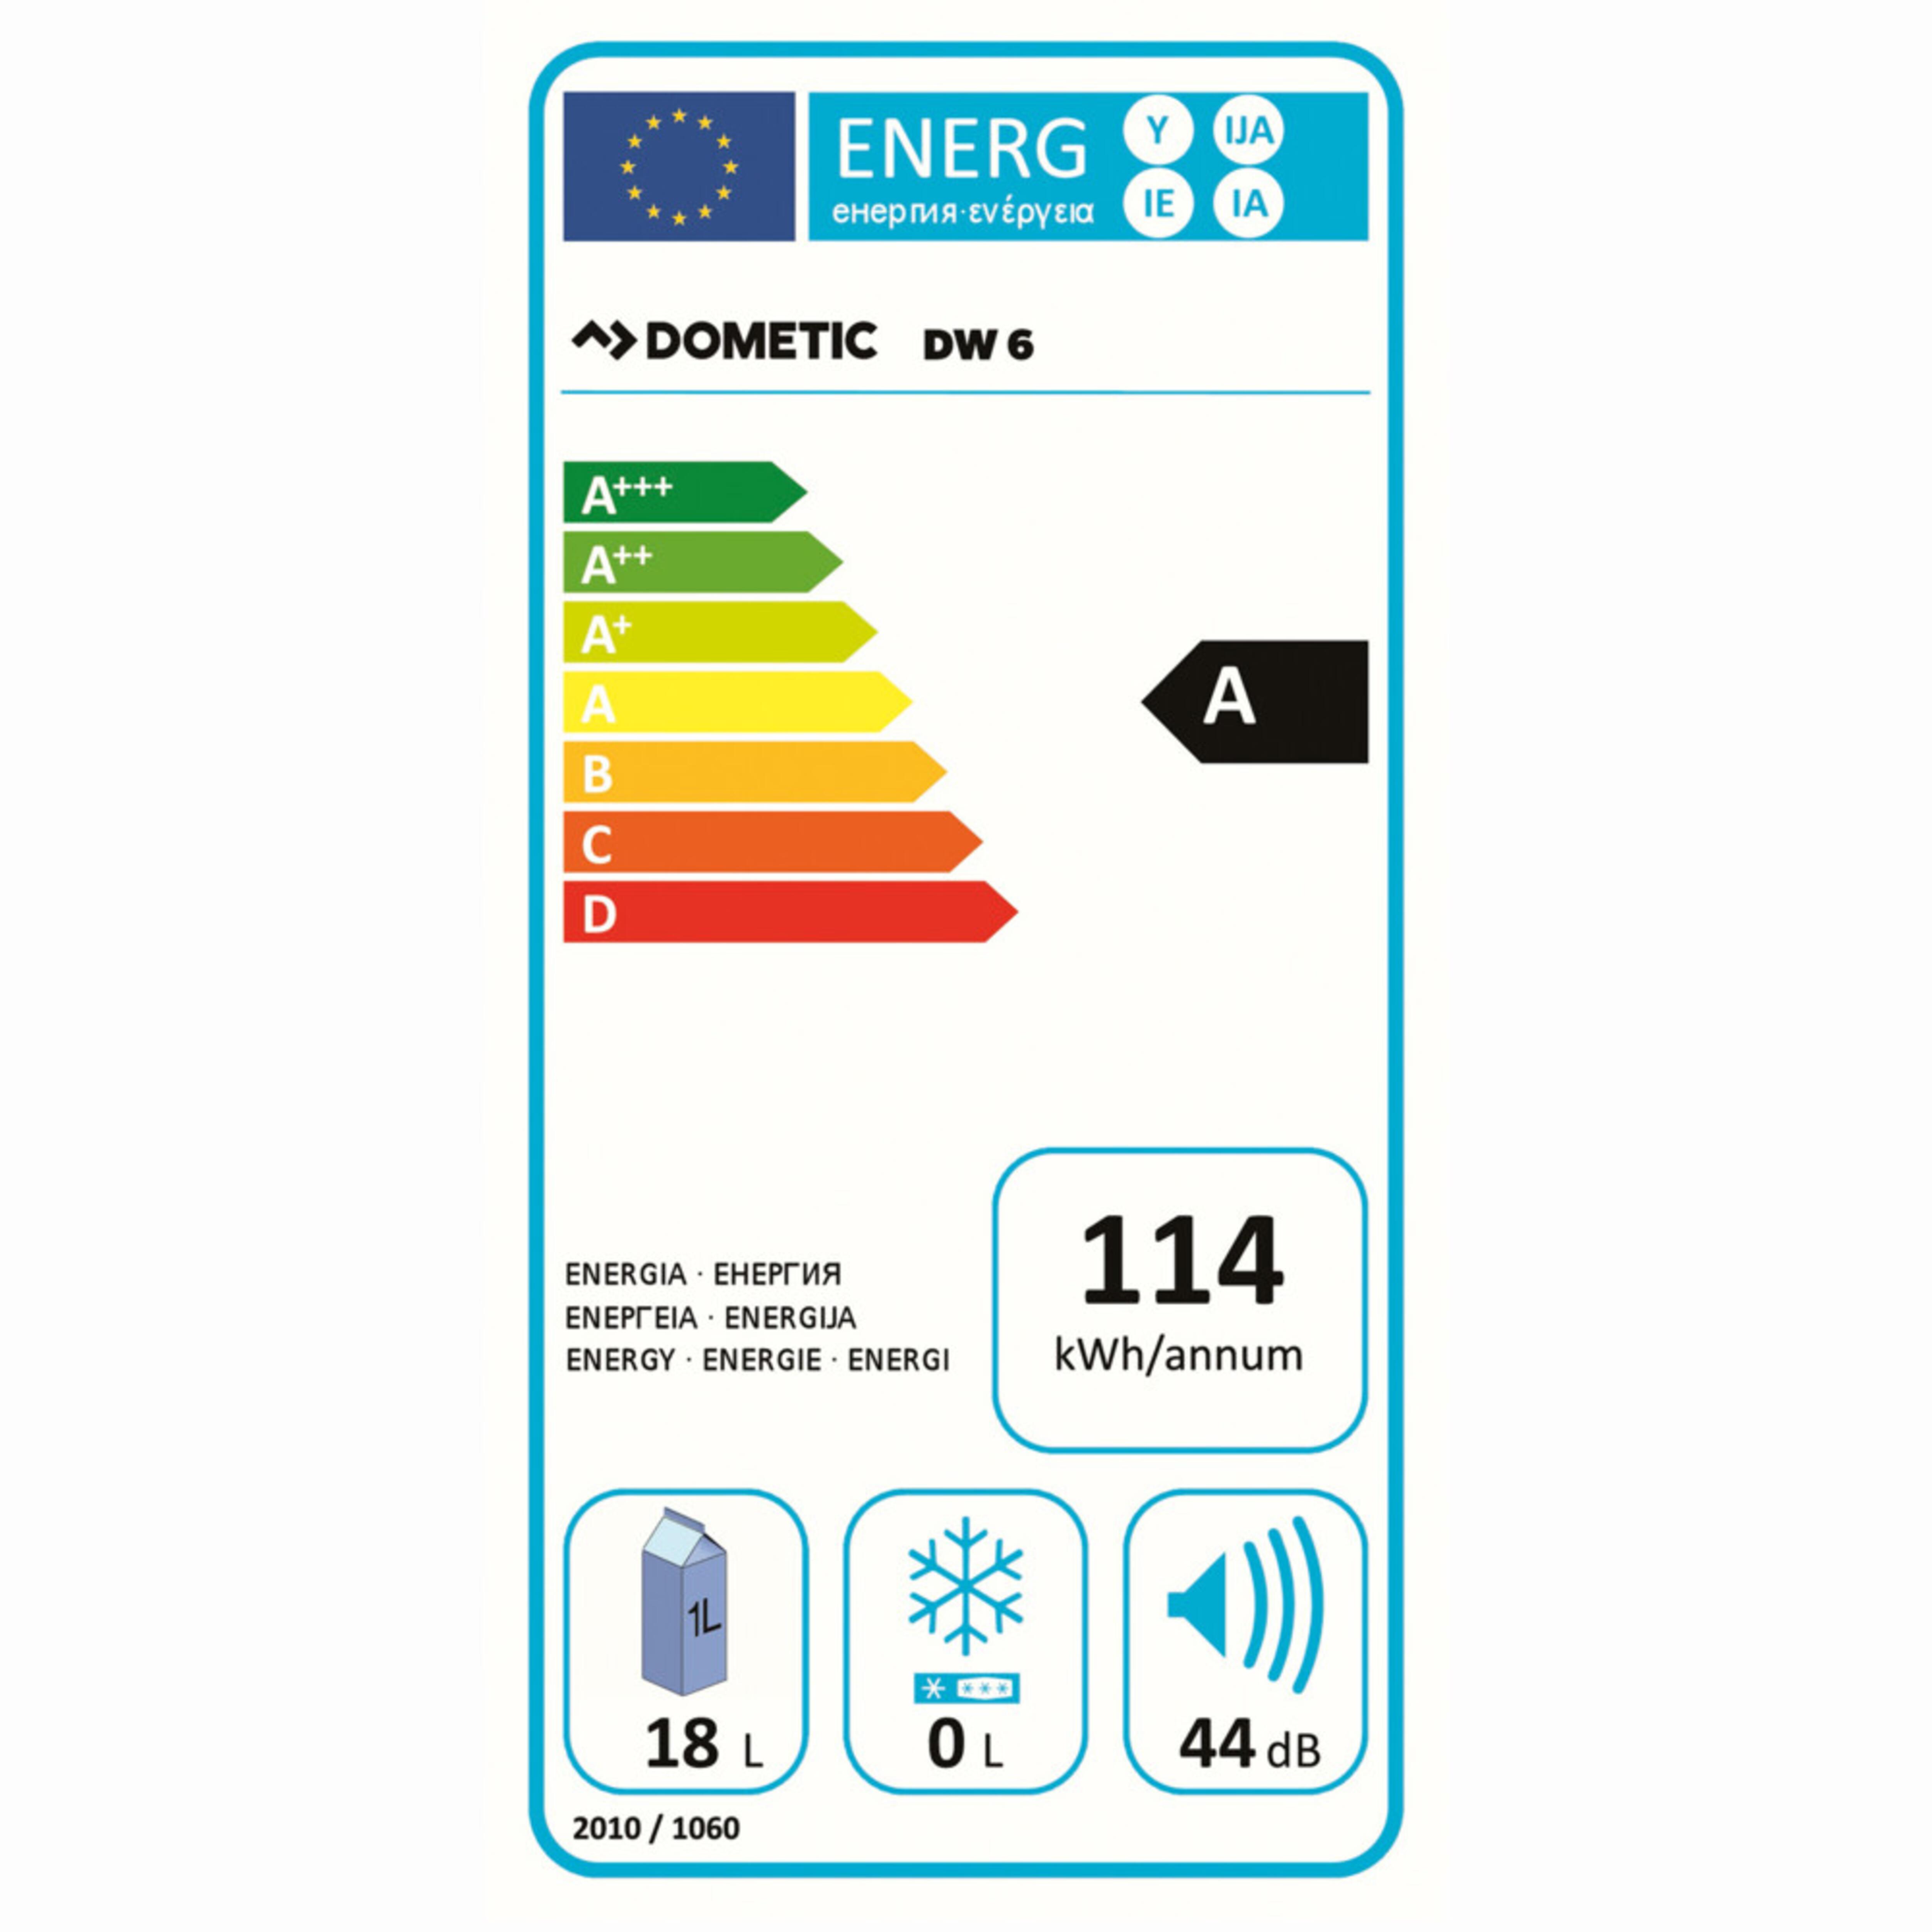 Dometic DW 6 Energimærke